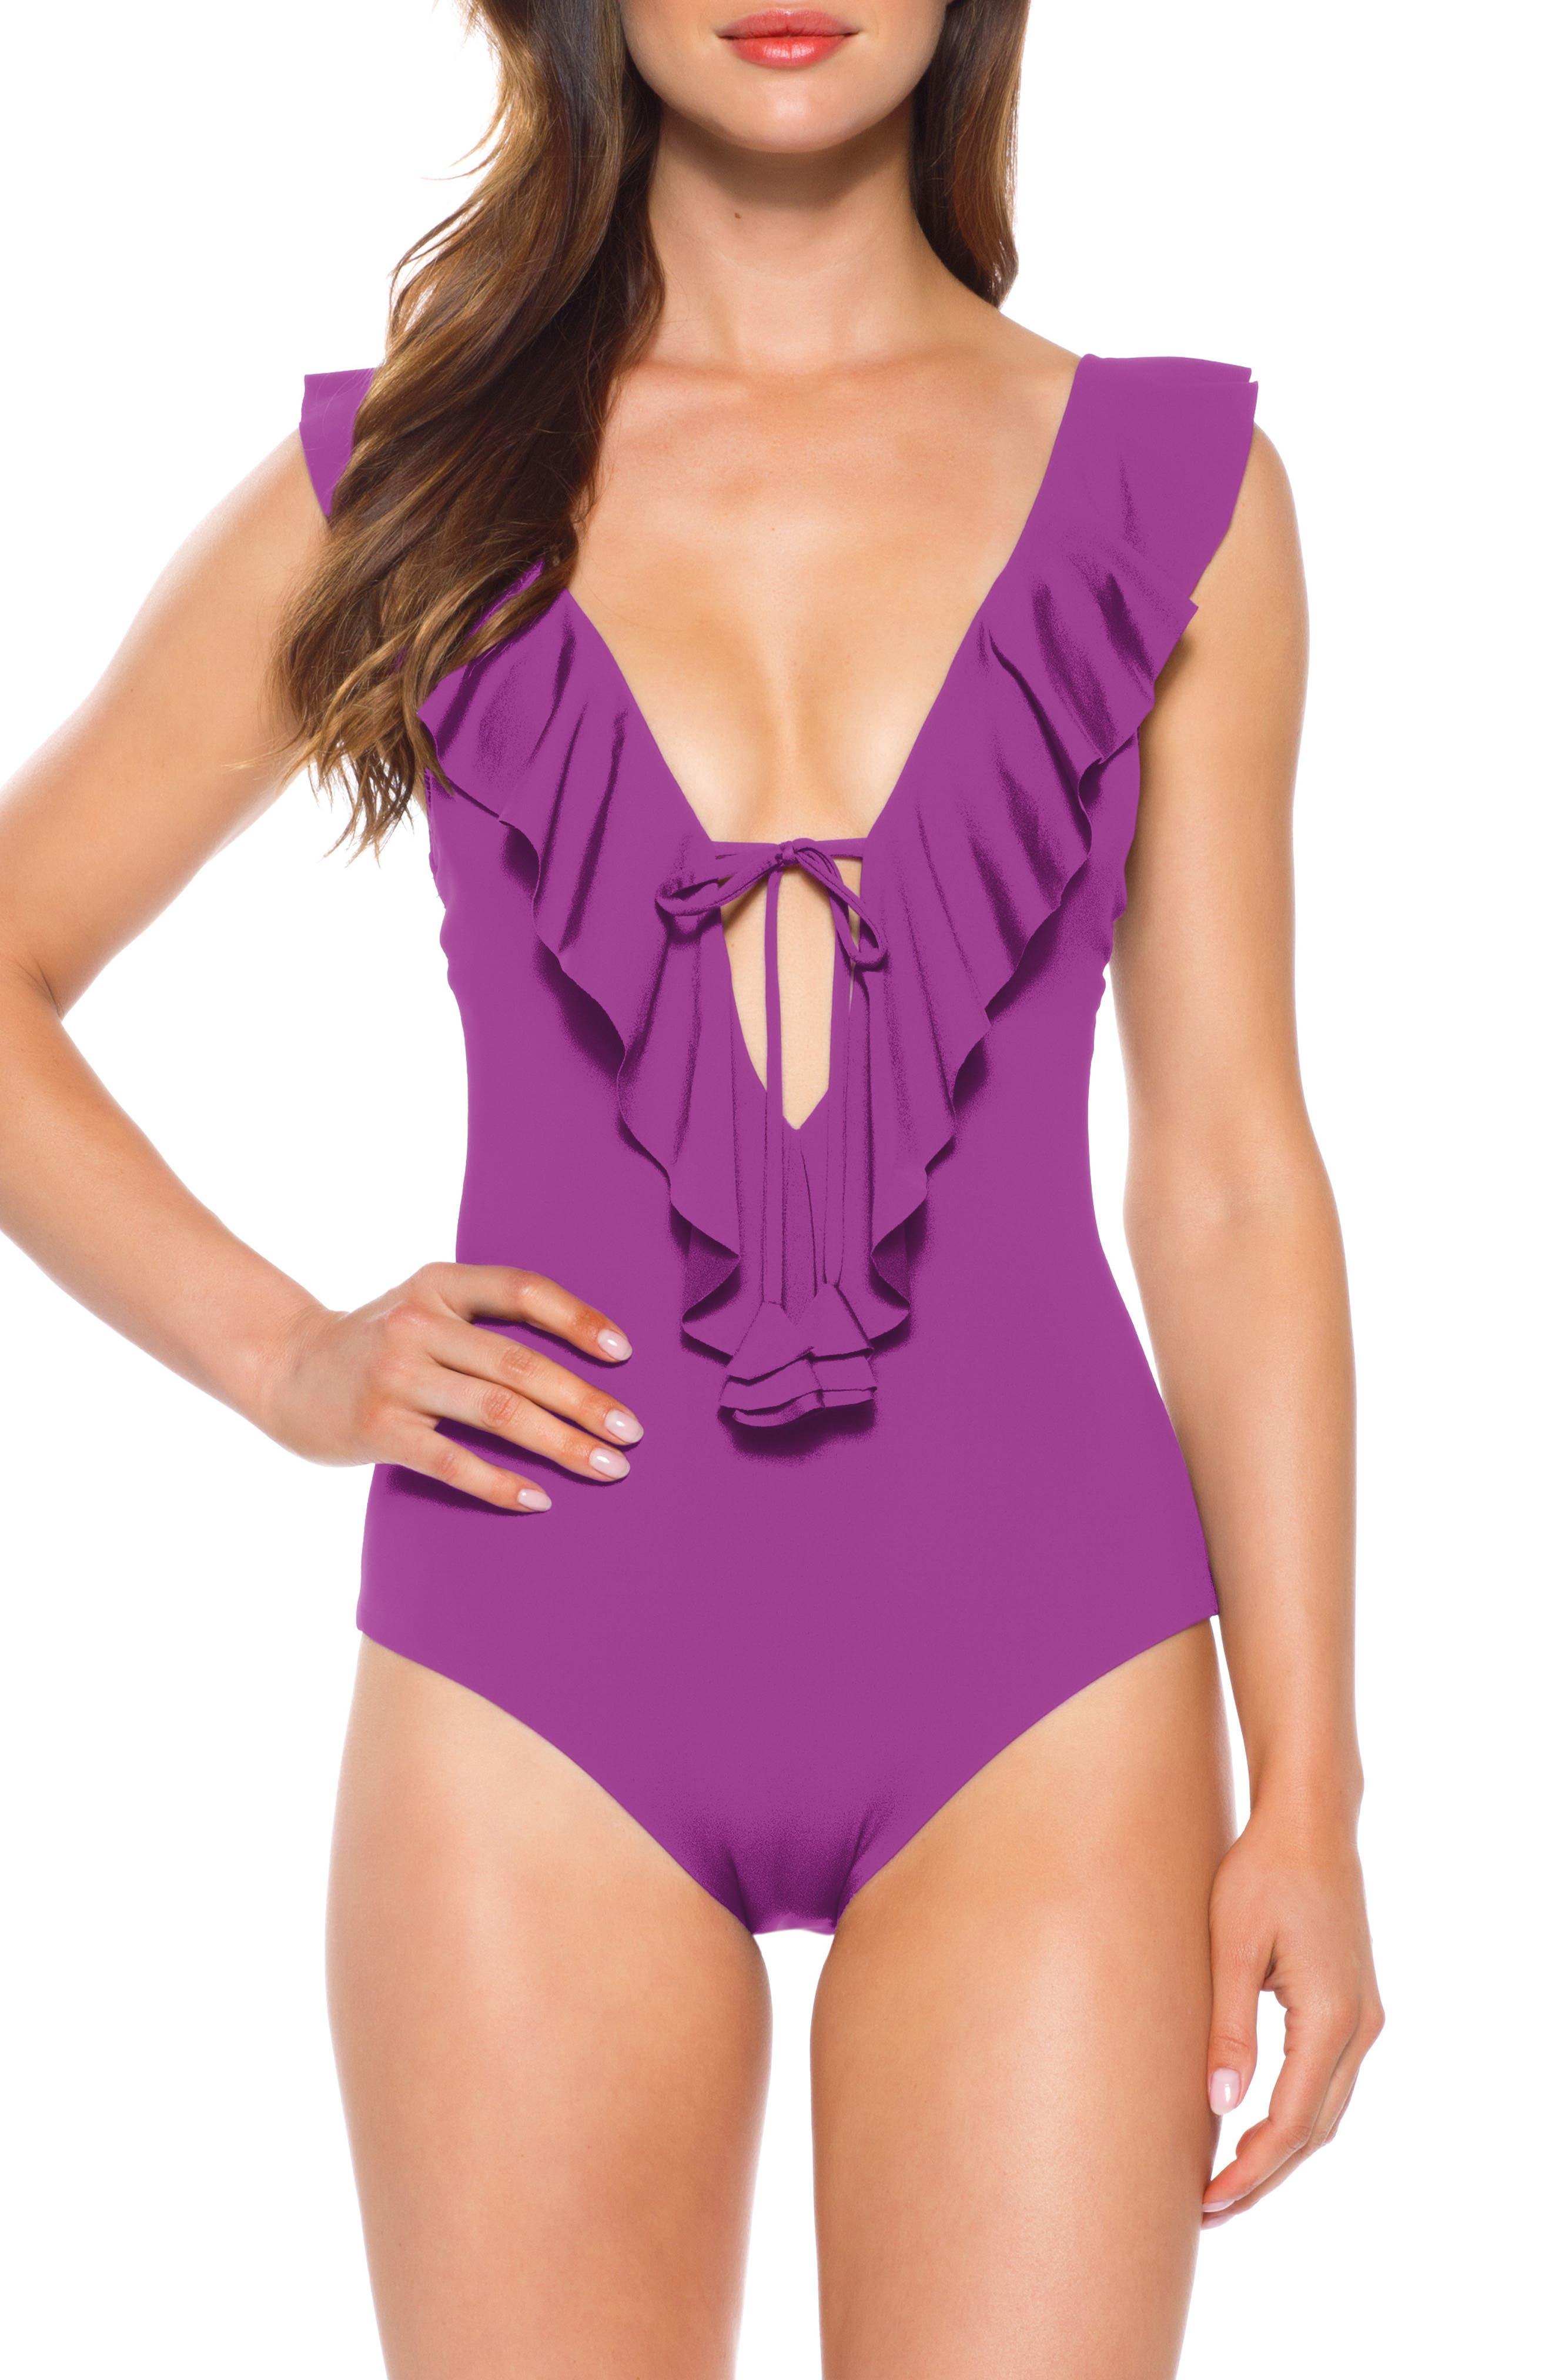 Becca Socialite Ruffle One-Piece Swimsuit, Purple